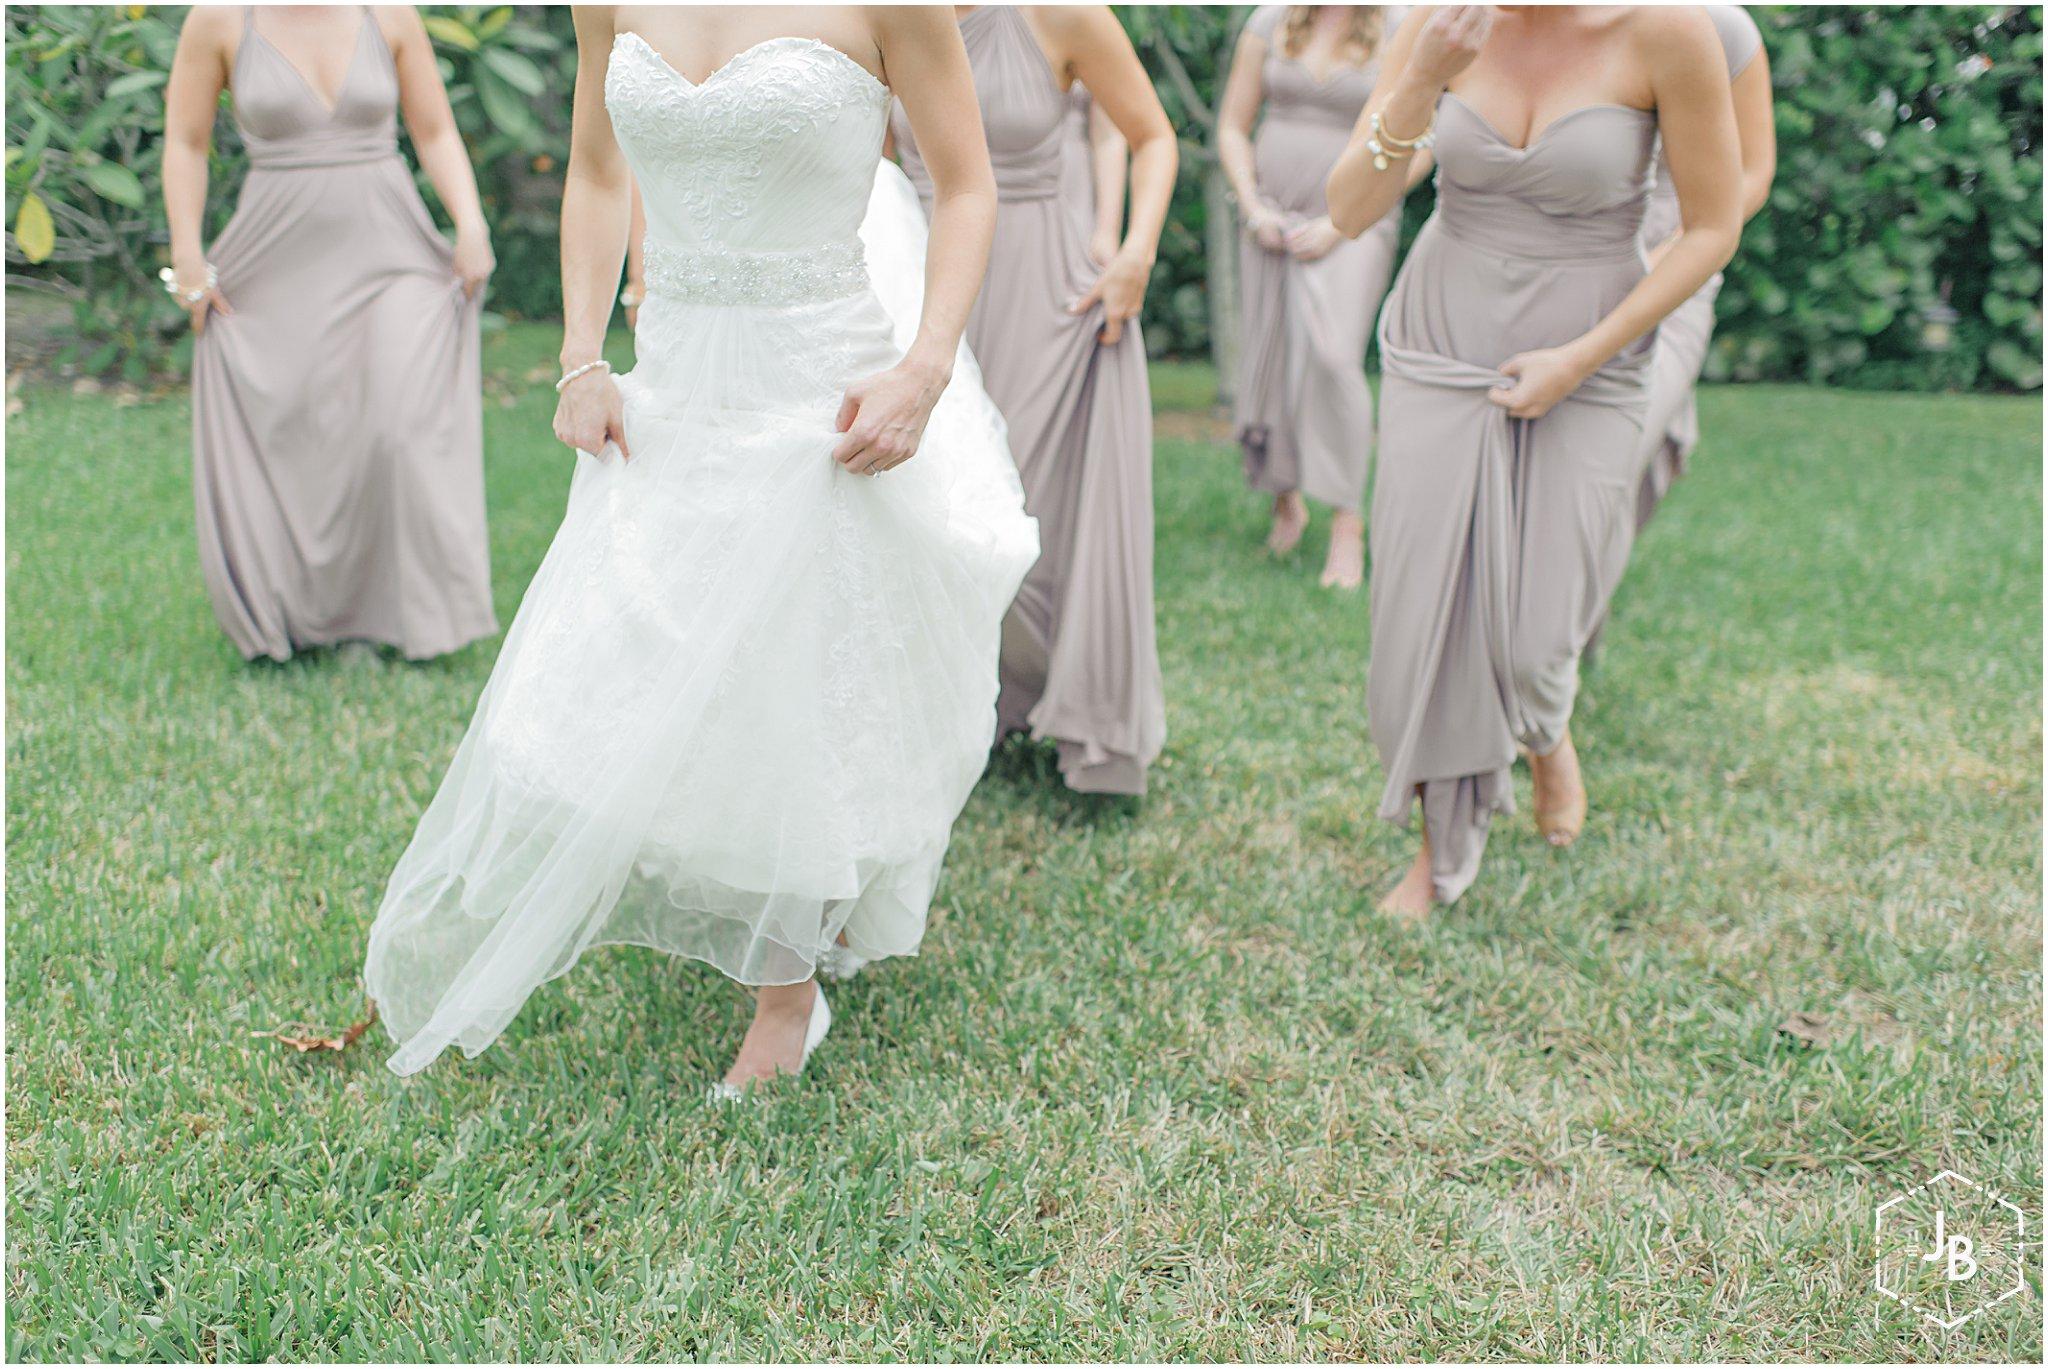 WeddingandEngagementFloridaPhotographer_0330.jpg